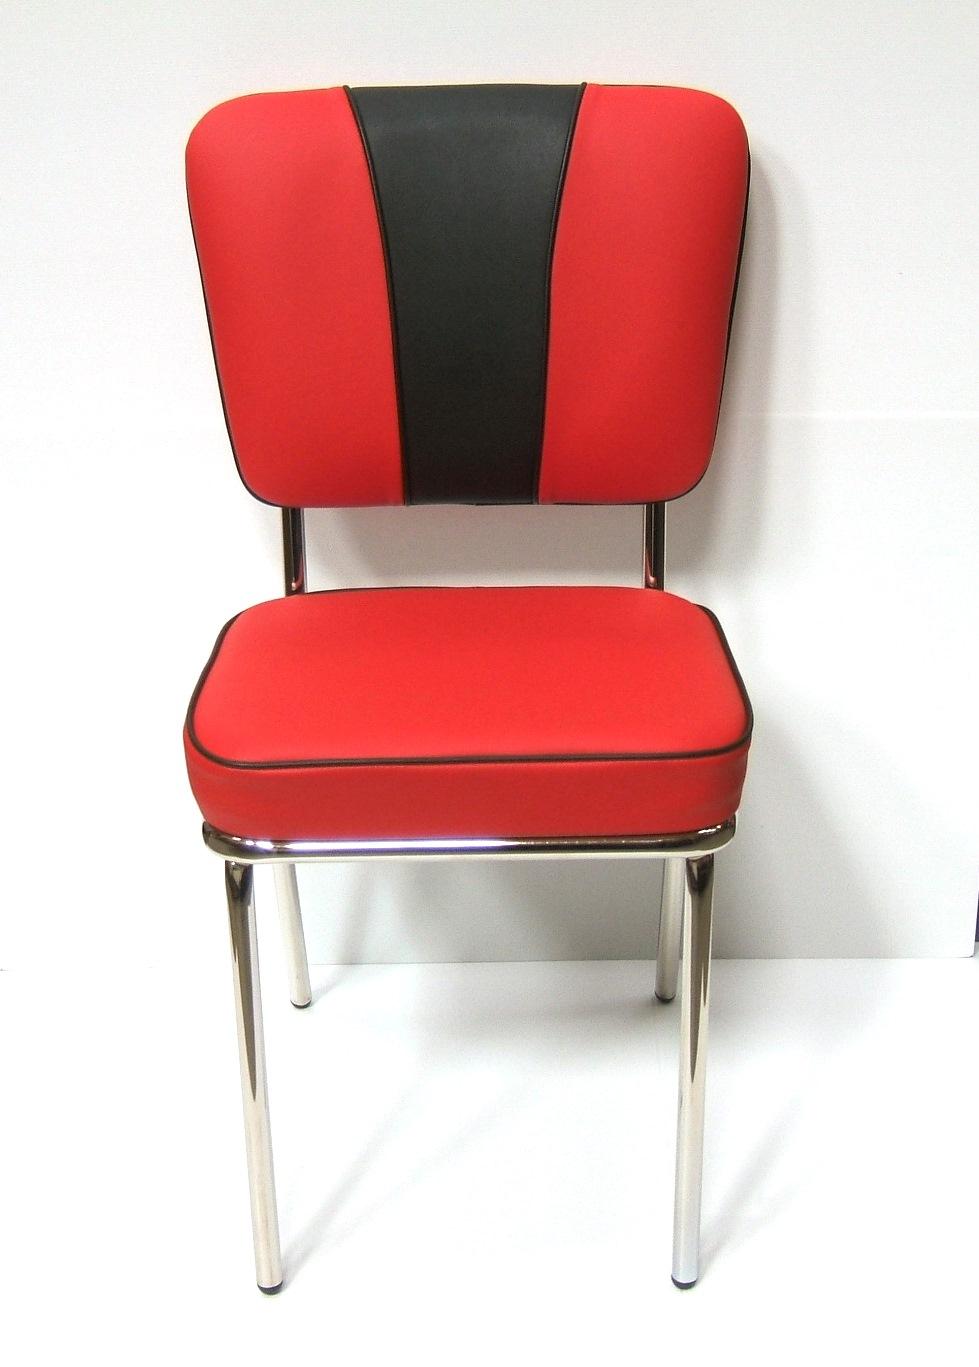 Retro Furniture Diner Chair – Miami – Lawton Imports Regarding Retro Sofas And Chairs (View 9 of 15)